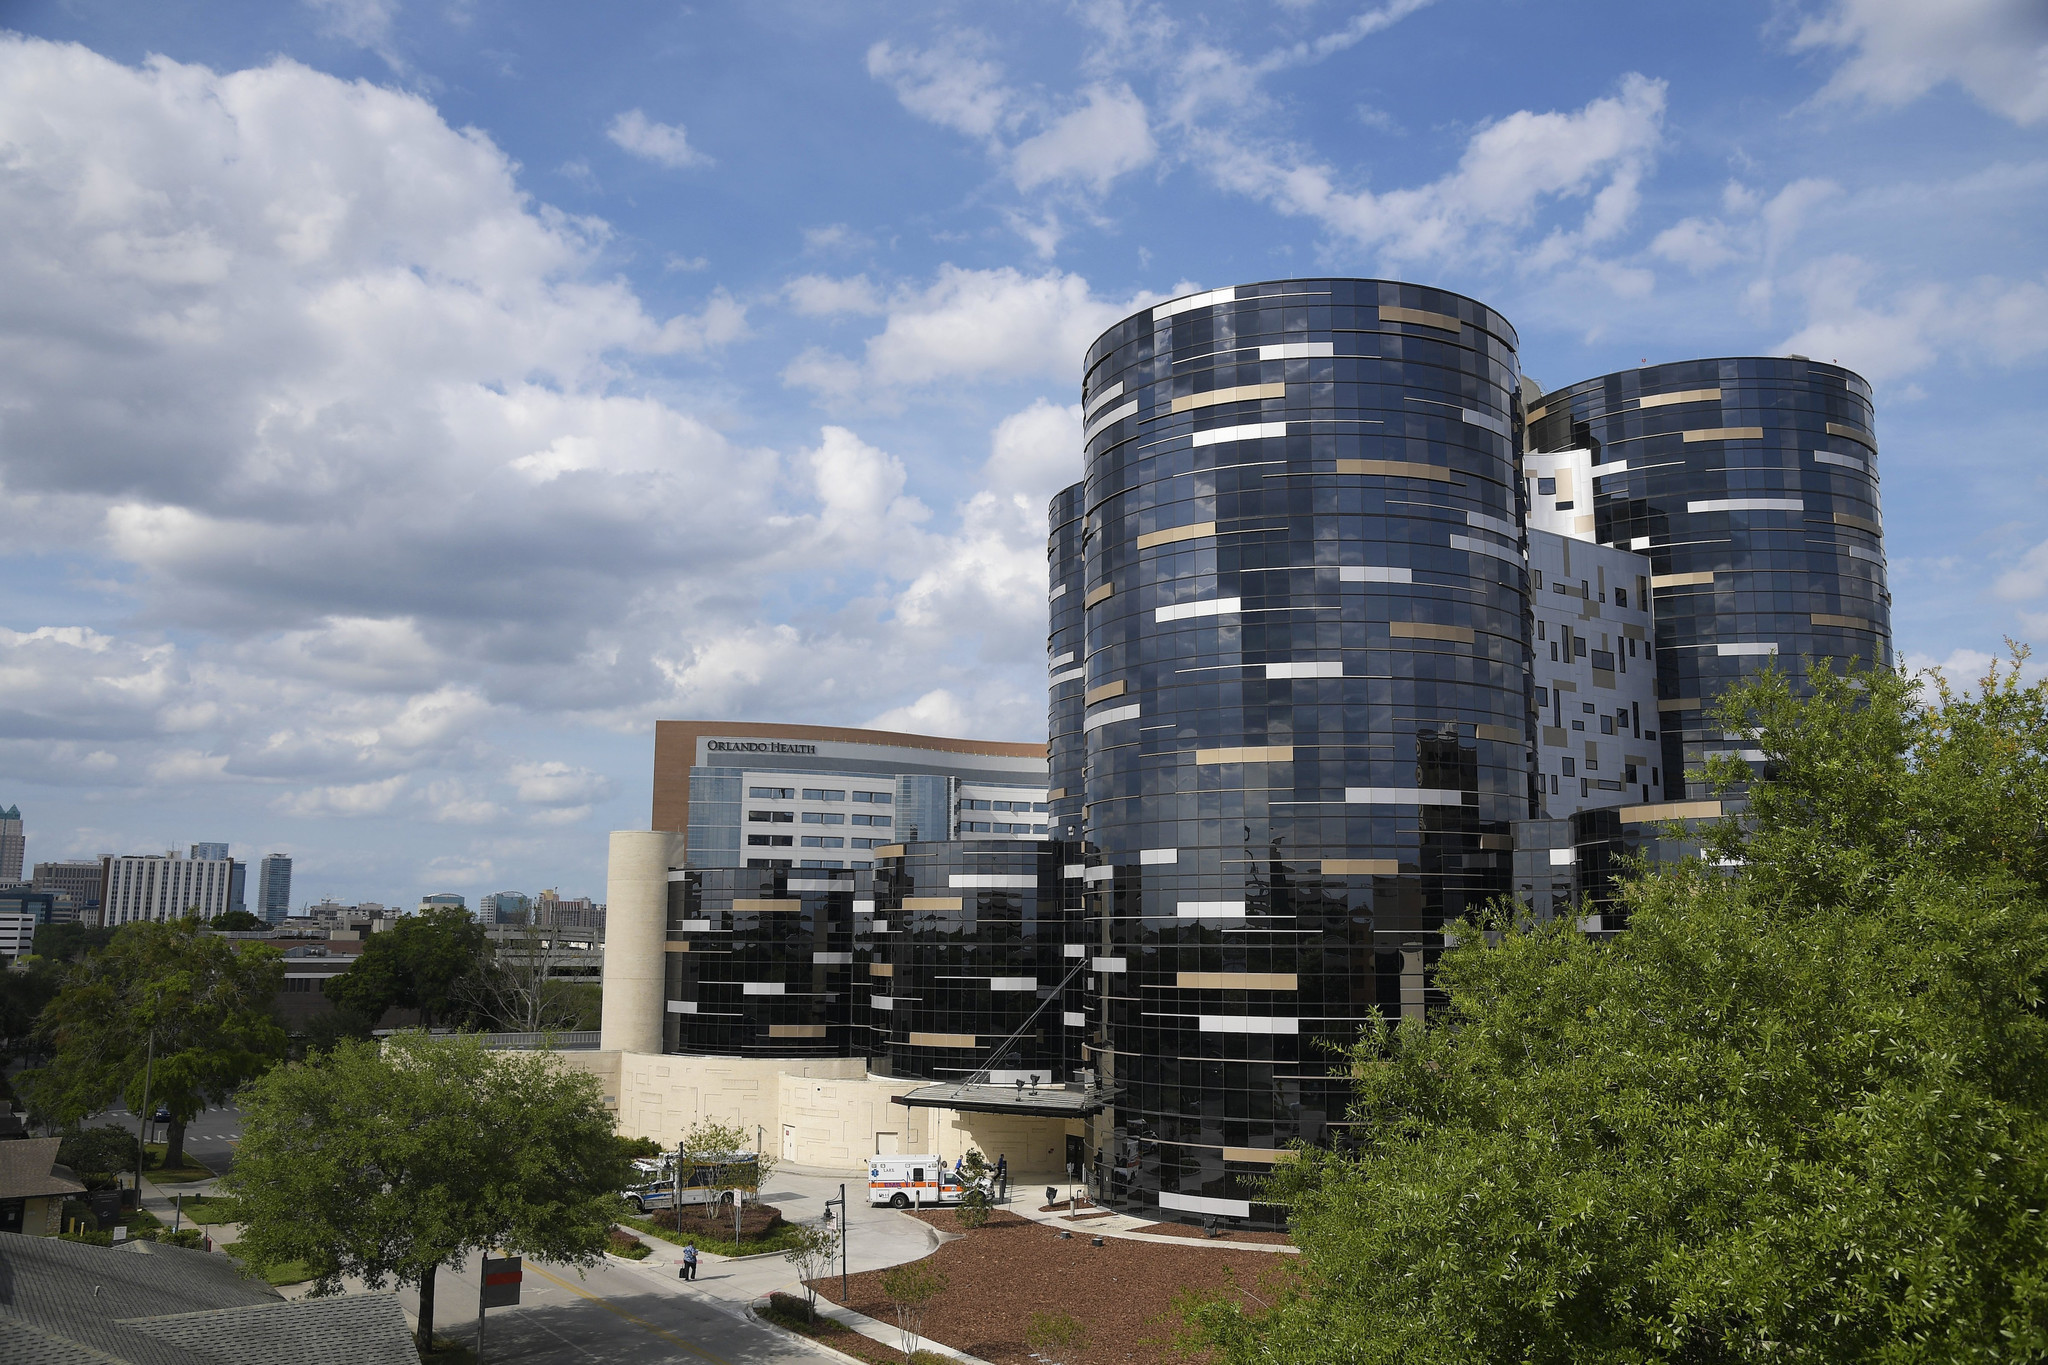 Orlando hospitals rise in u s news best hospitals rankings orlando sentinel